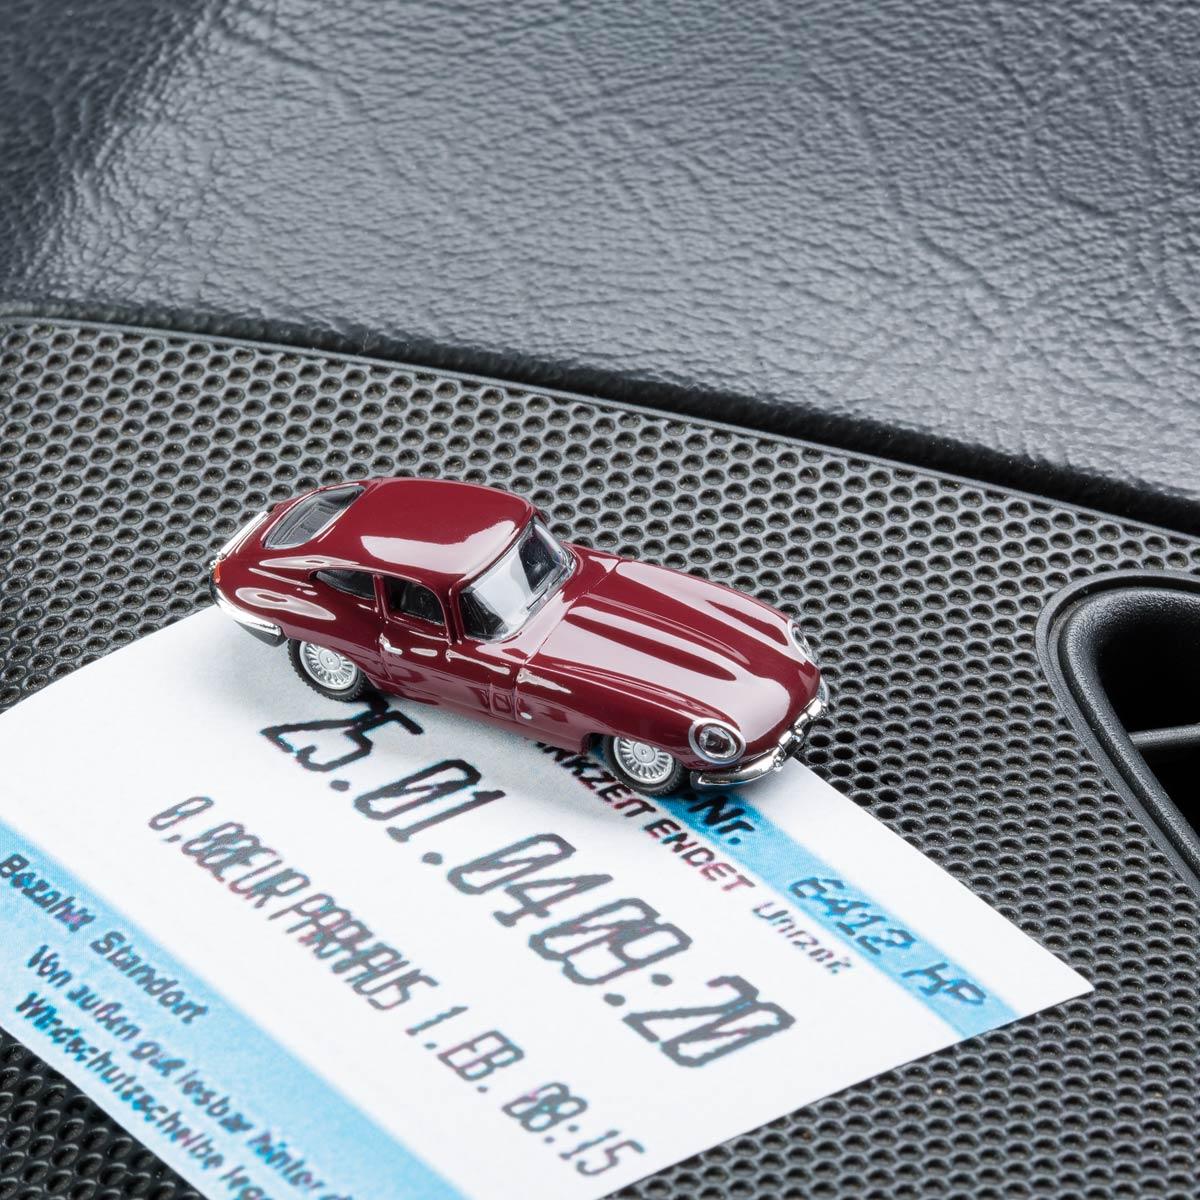 Jaguar E-Type die-cast with magnet as parking ticket holder | The Design Gift Shop